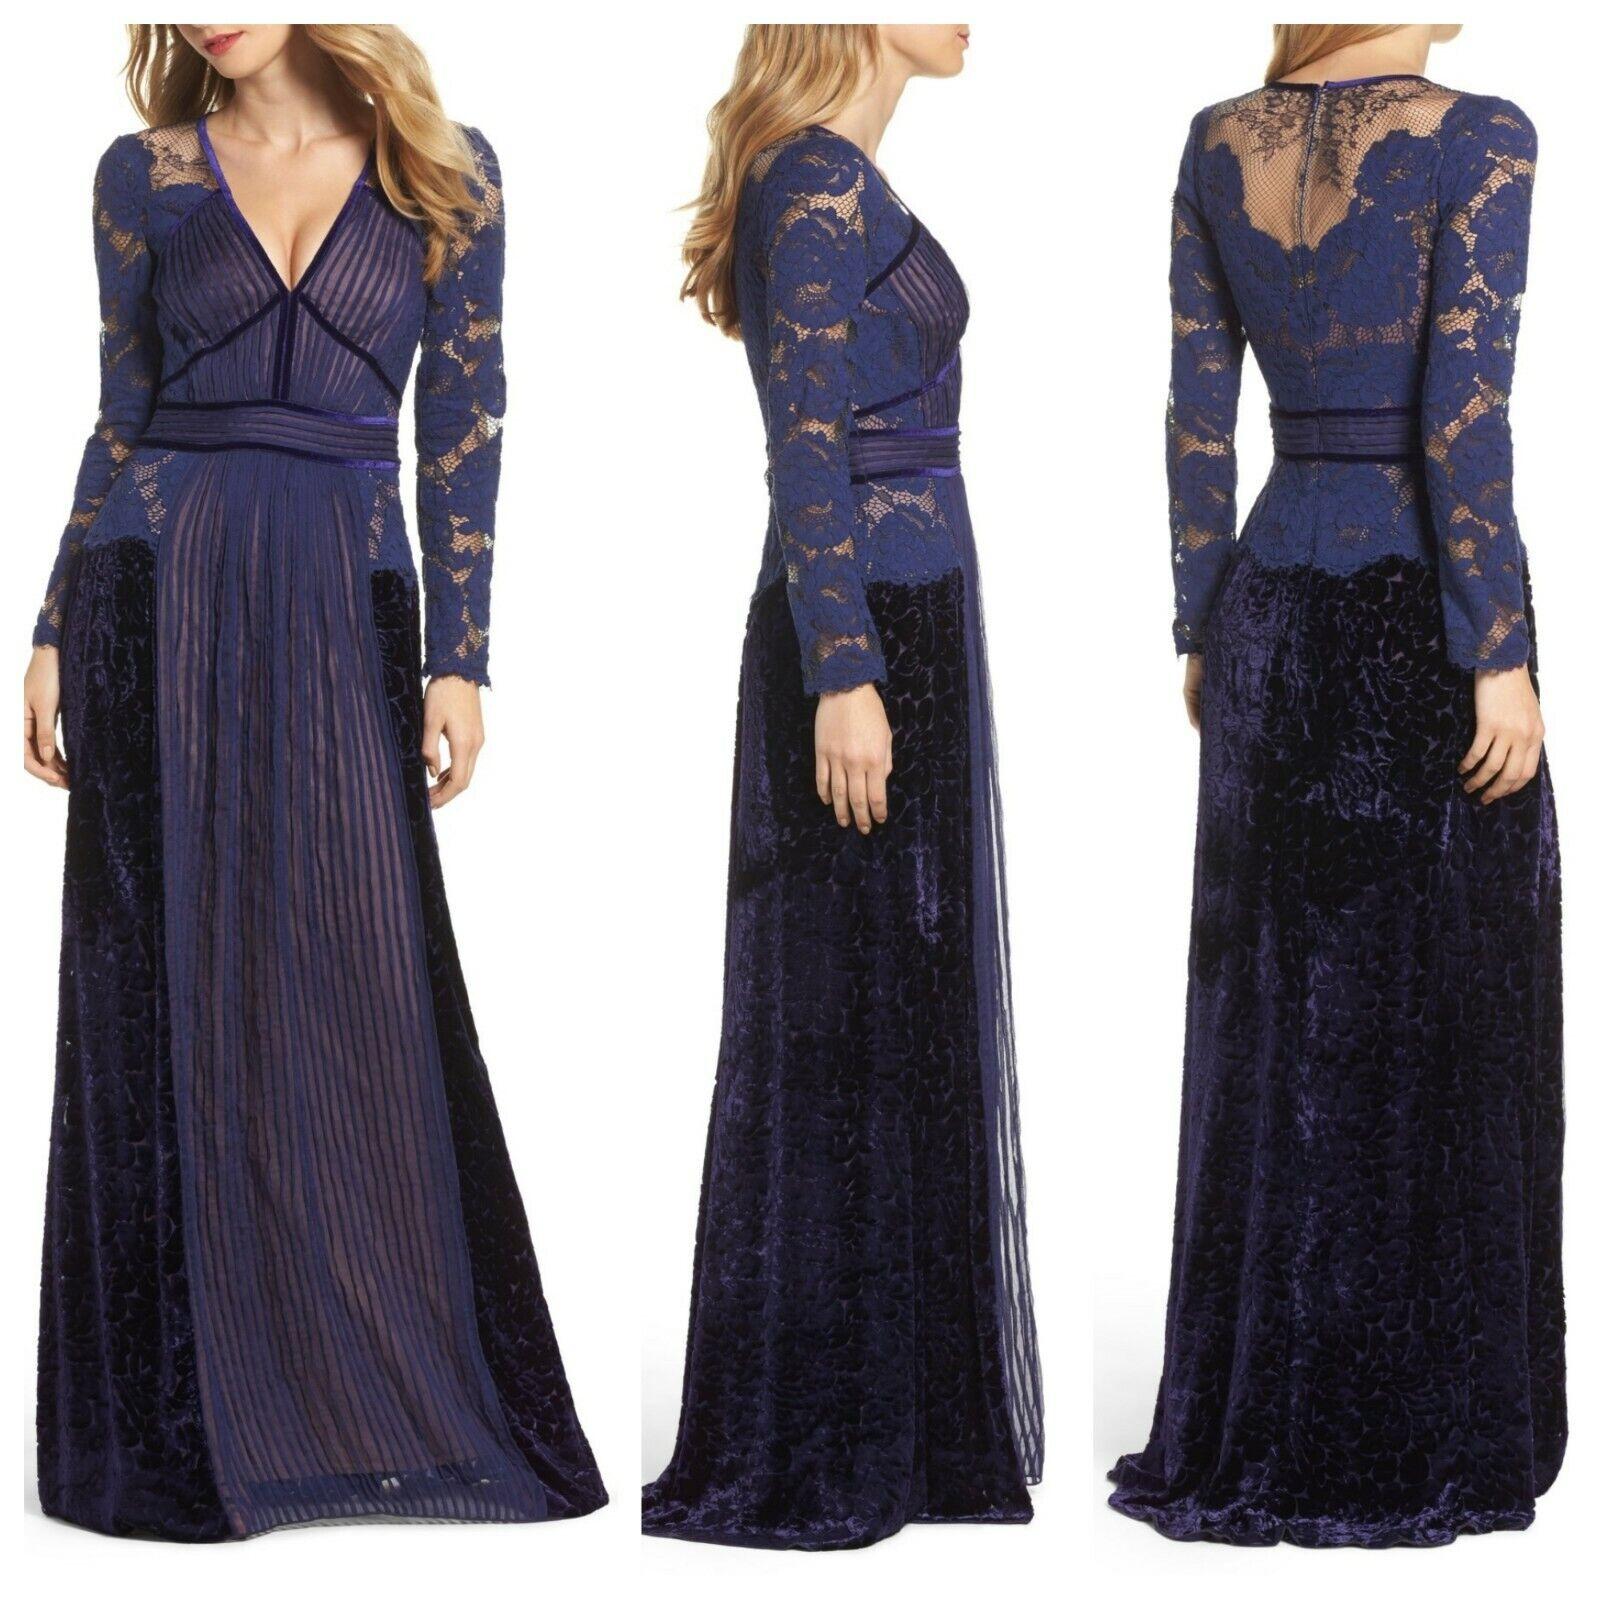 a84fffa0003 Tadashi Shoji Mixed Media A-Line Gown Notte   16   E387 SZ NWT oodkjt3780- Dresses